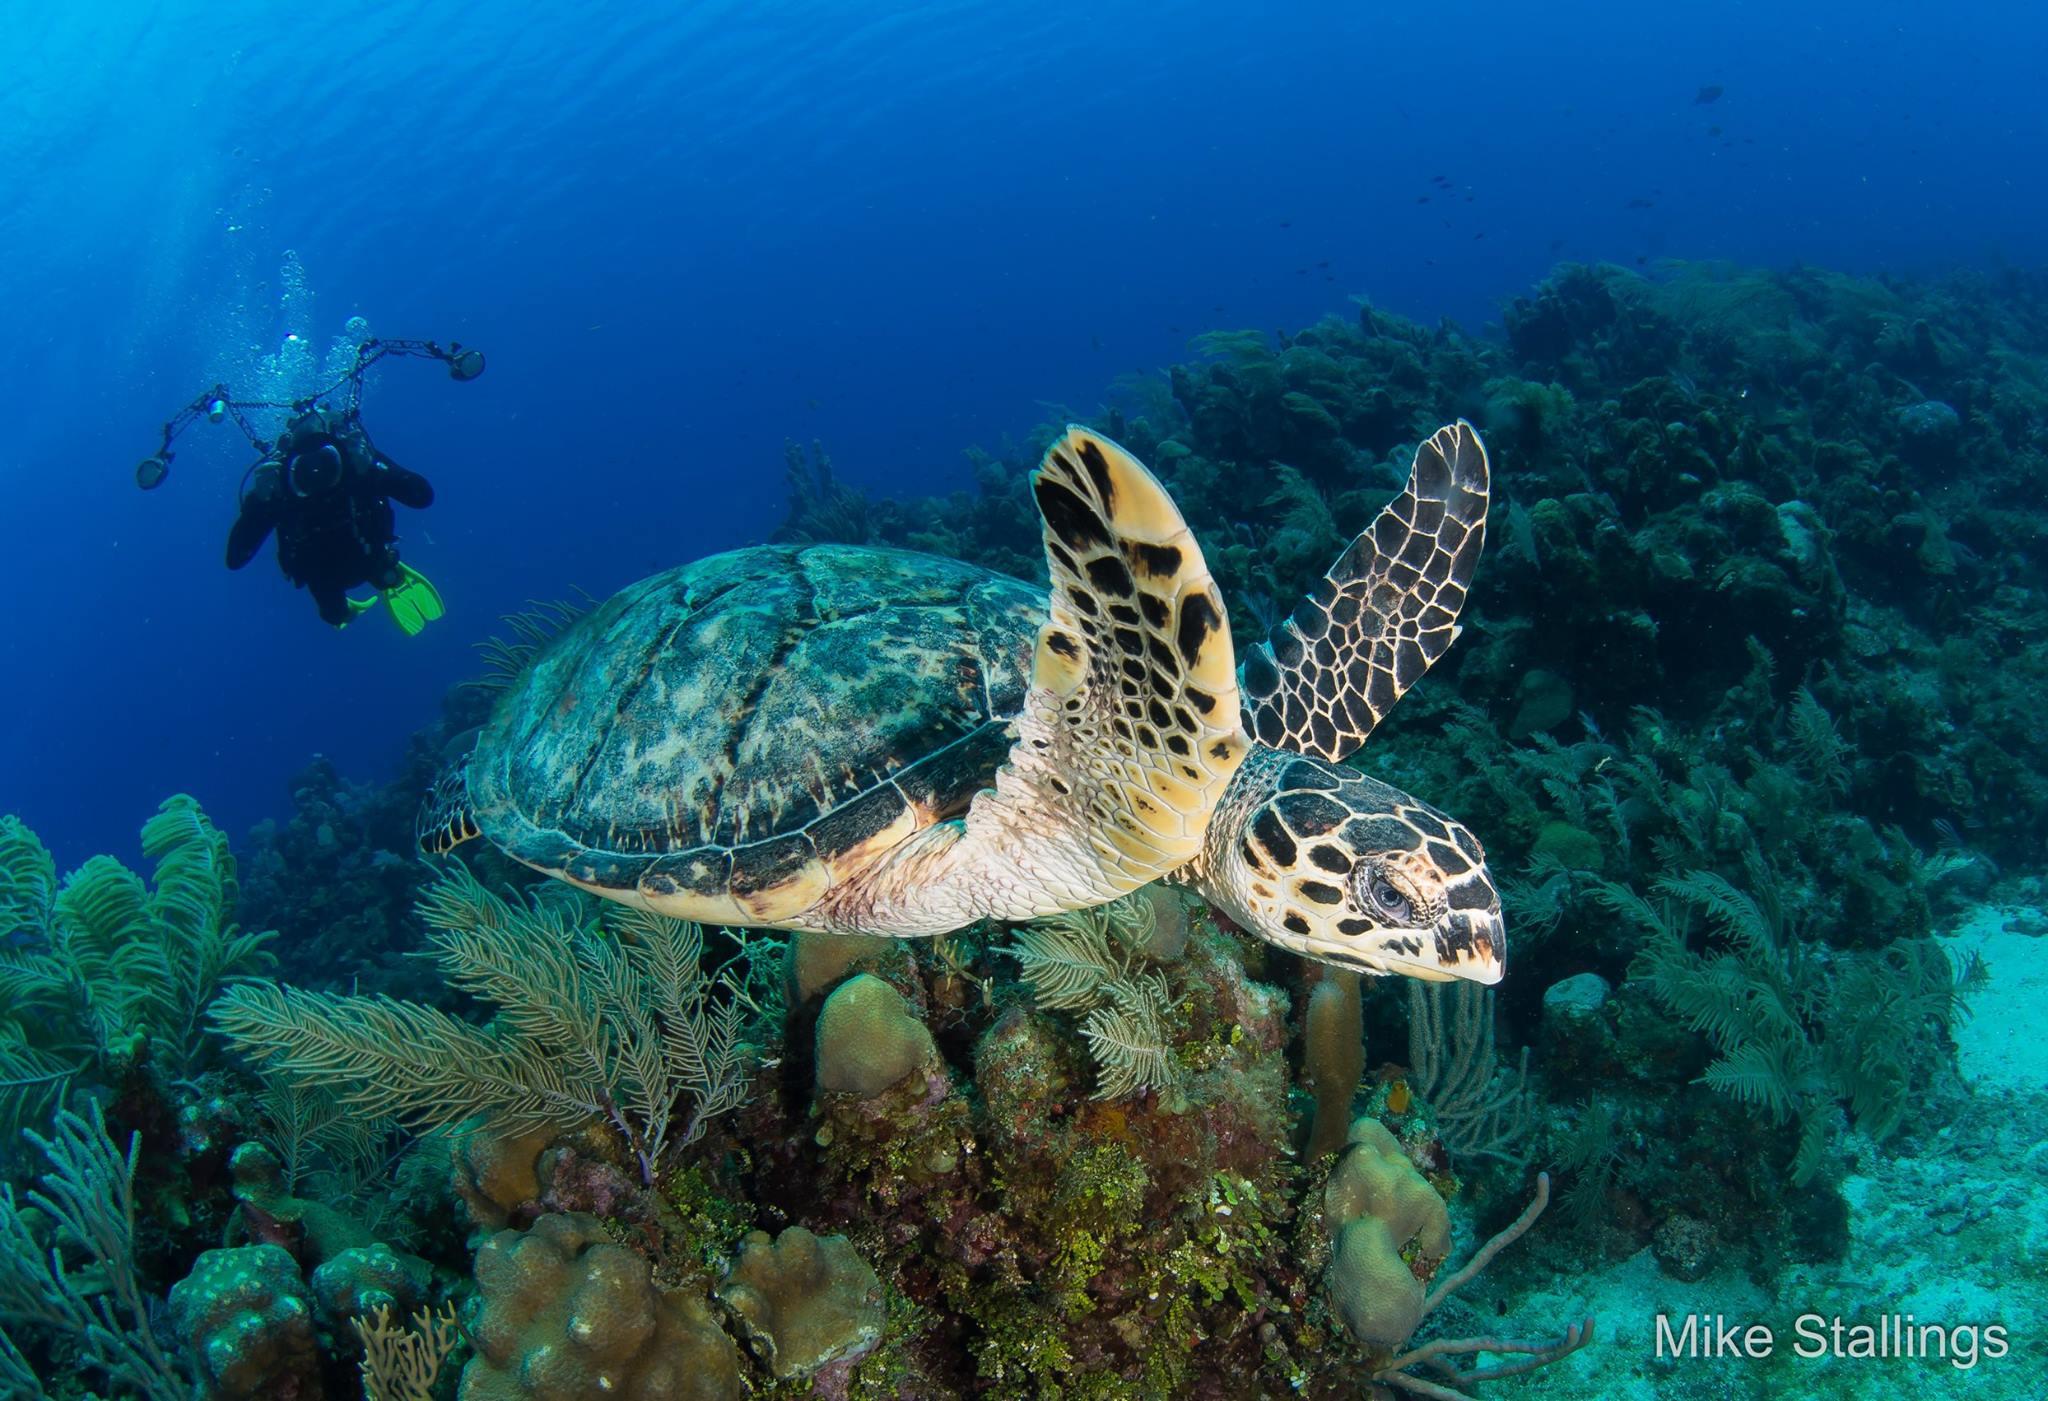 Shutterbug Mike Stallings Wins Best OF Show At Roatan Underwater Photo Festival